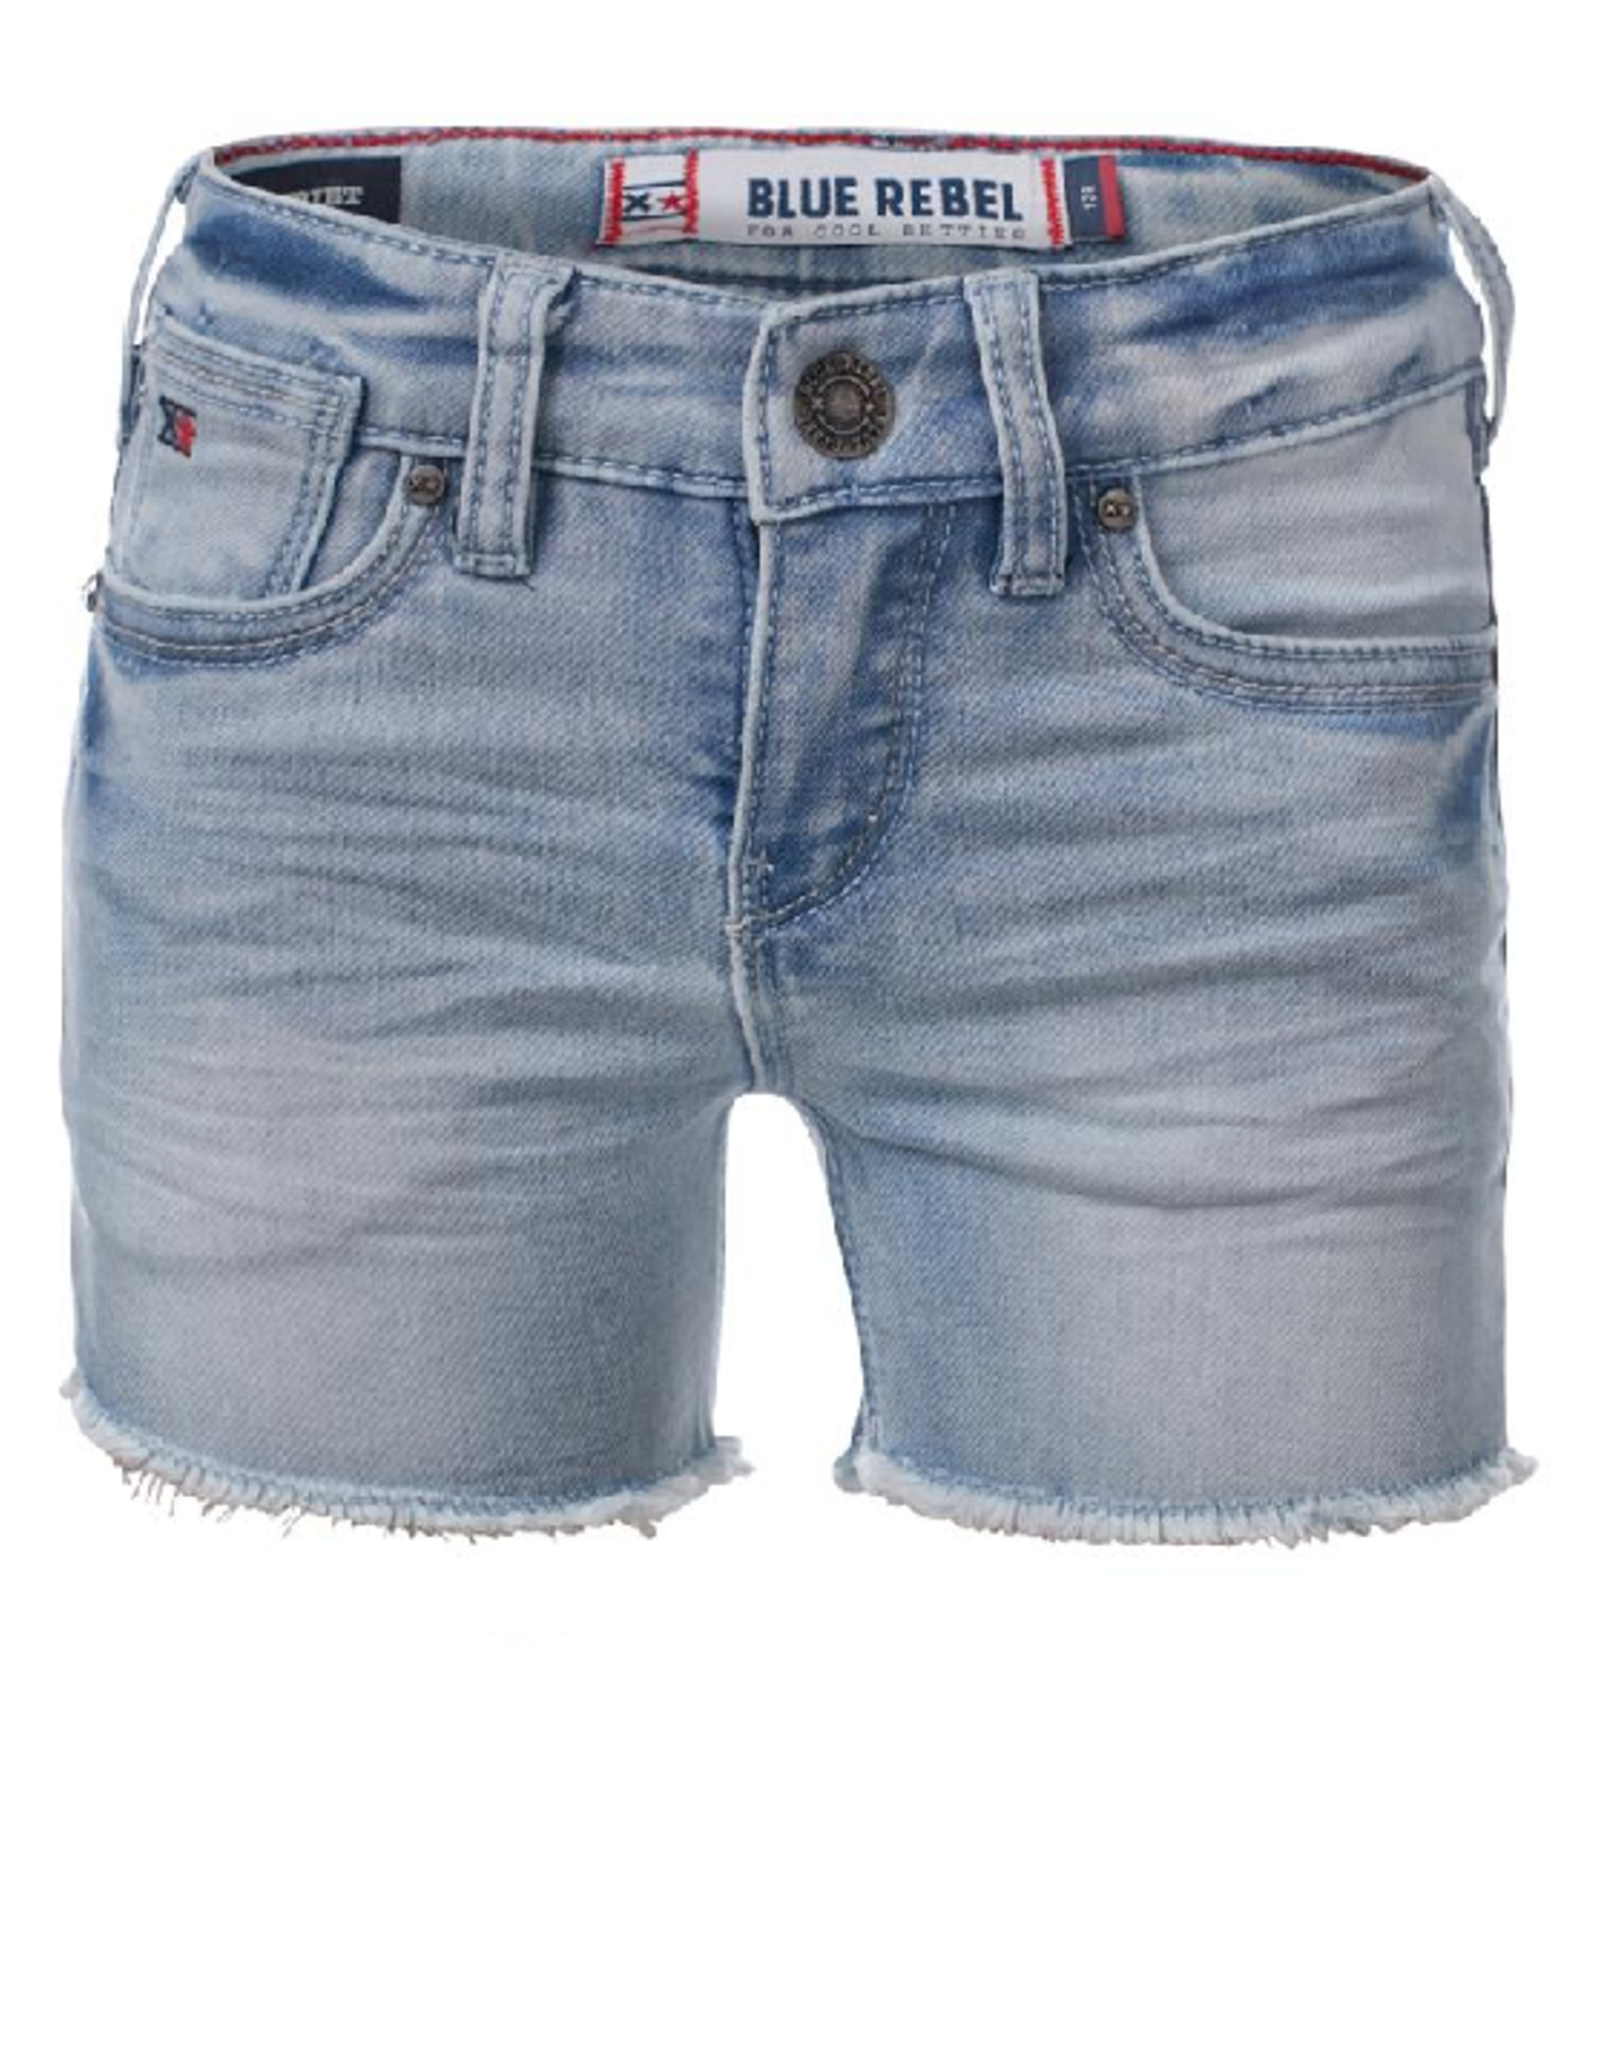 Blue Rebel Jeansshort meisjes light denim  PYRIET 0142060